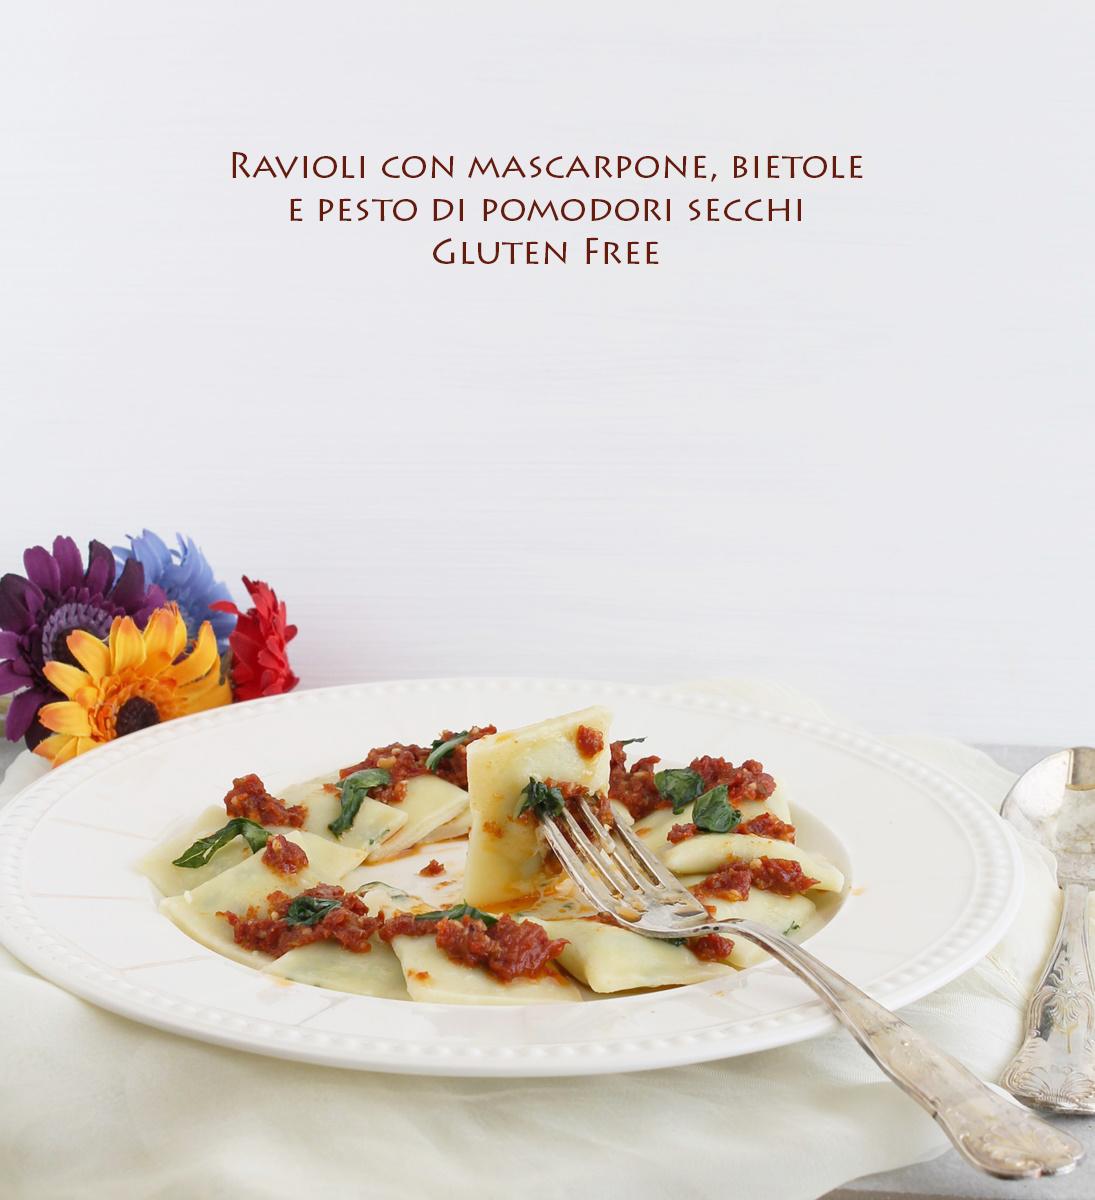 Ravioli senza glutine per Piaceri Mediterranei - La Cassata Celiaca